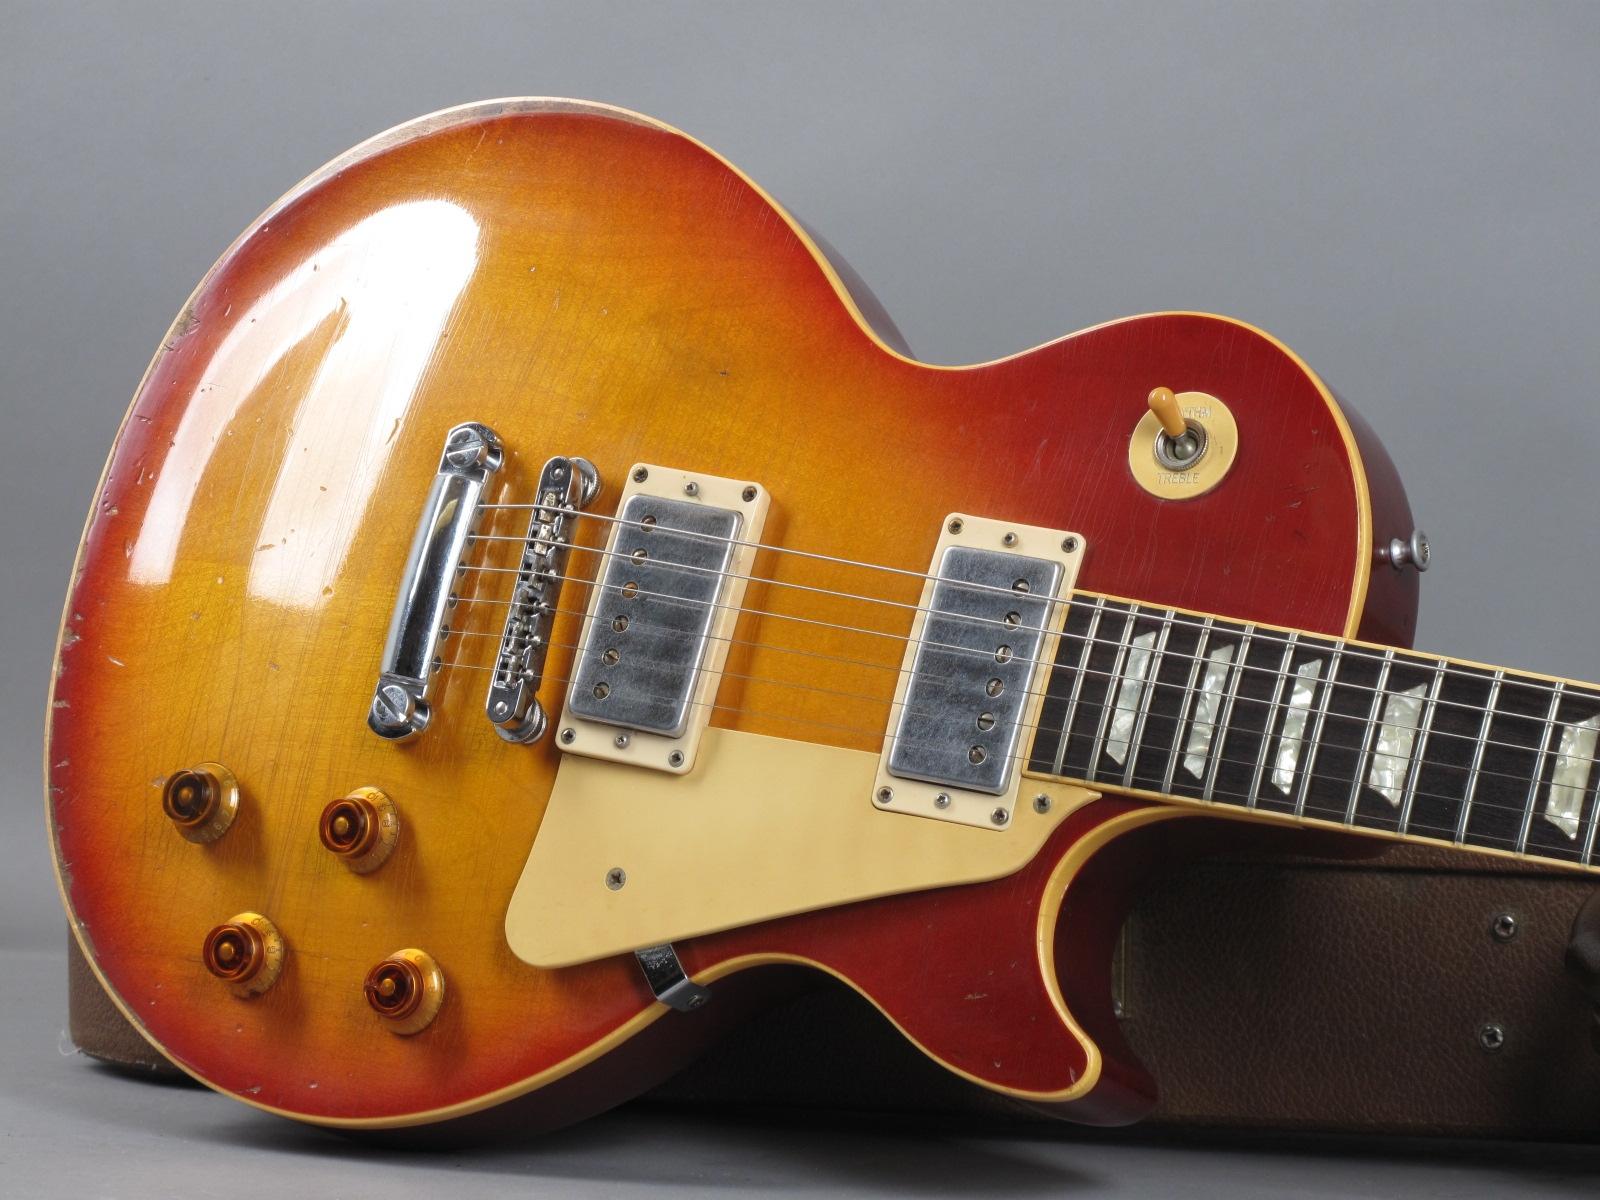 https://guitarpoint.de/app/uploads/products/1992-gibson-les-paul-standard-cherry-sunburst/1992-Gibson-Les-Paul-Standard-Cherry-Sunburst-92112398_19.jpg